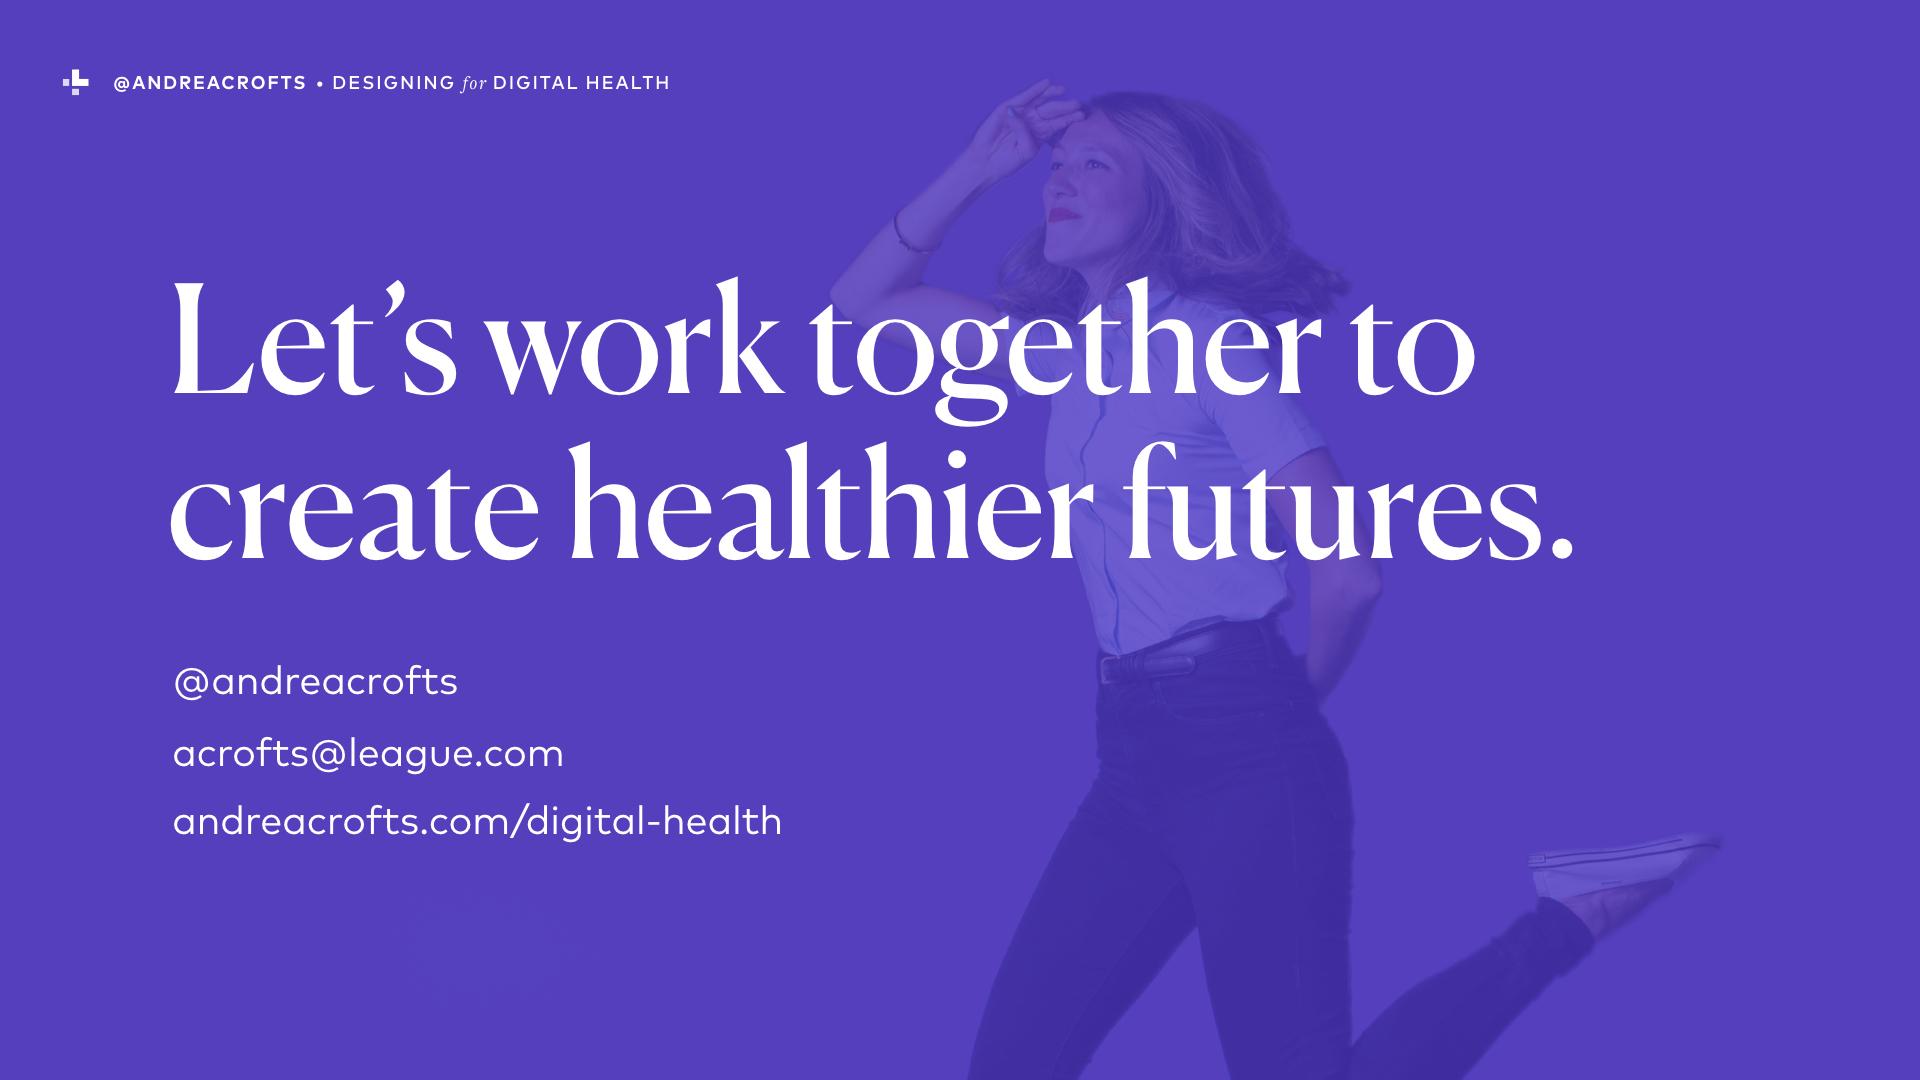 Andrea-Crofts-Digital-Health-Thanks.jpeg